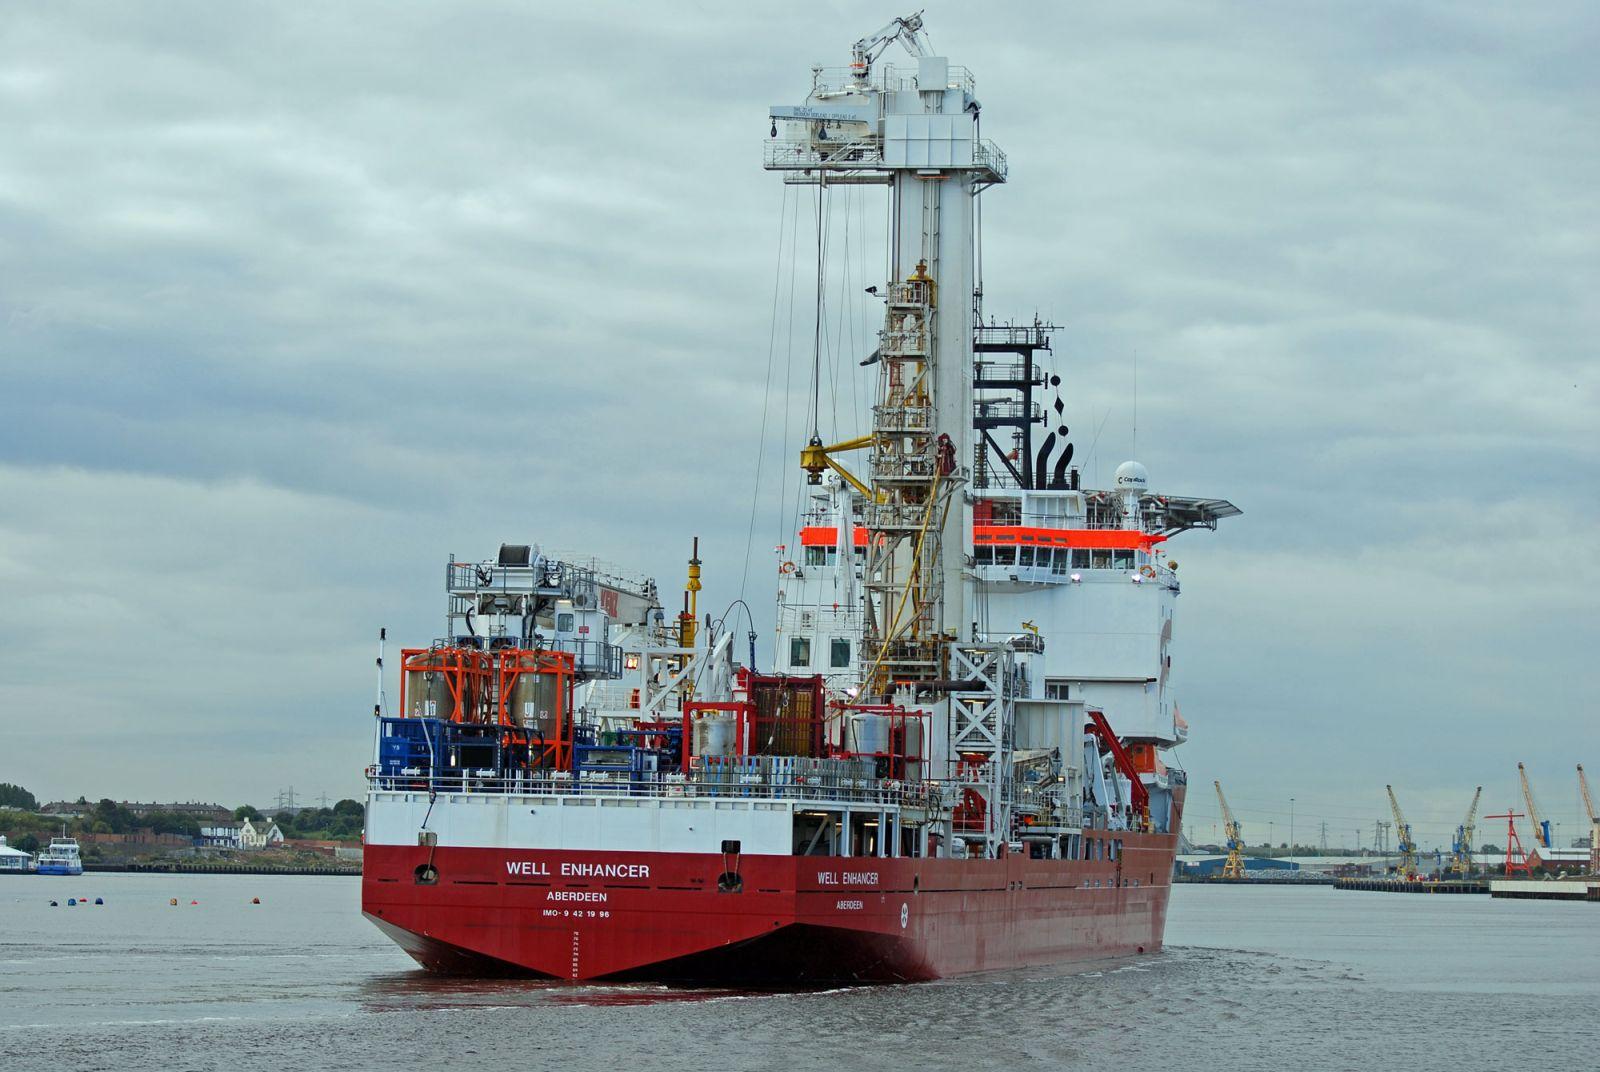 Well Enhancer - Unknown Vessels - Gallery - TrawlerPictures net